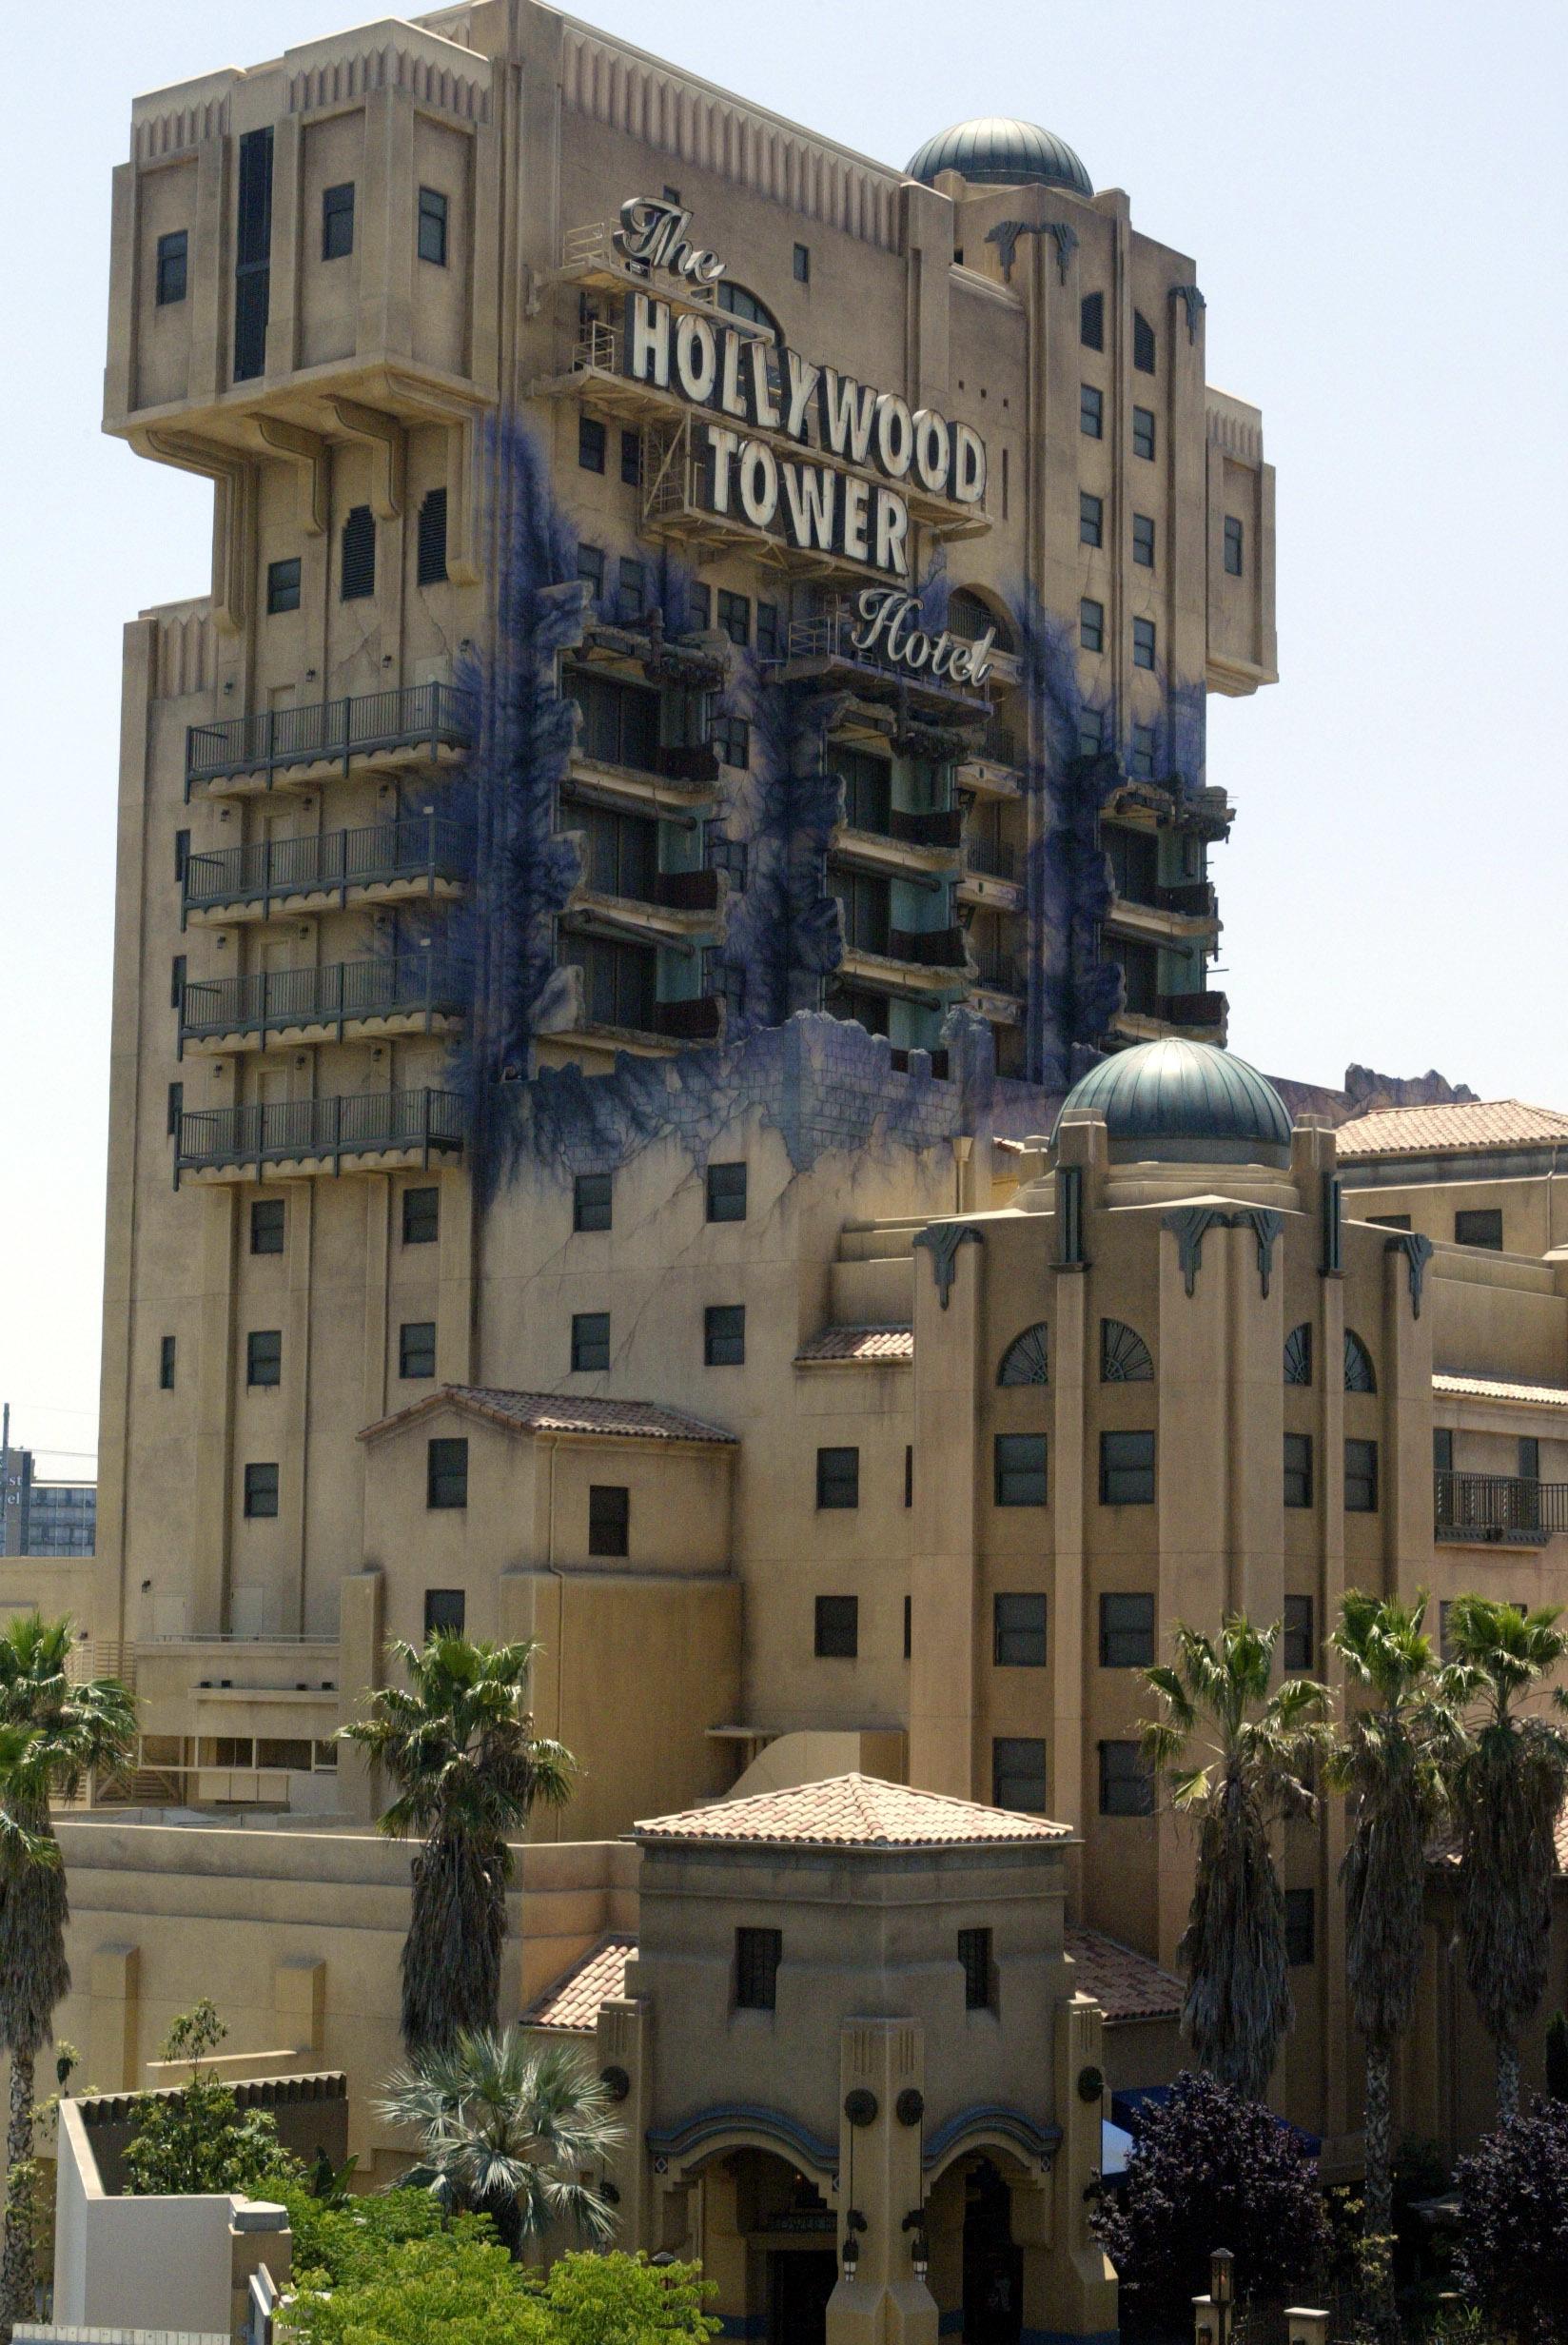 Disneyland S Tower Of Terror Making Way For Guardians Ride